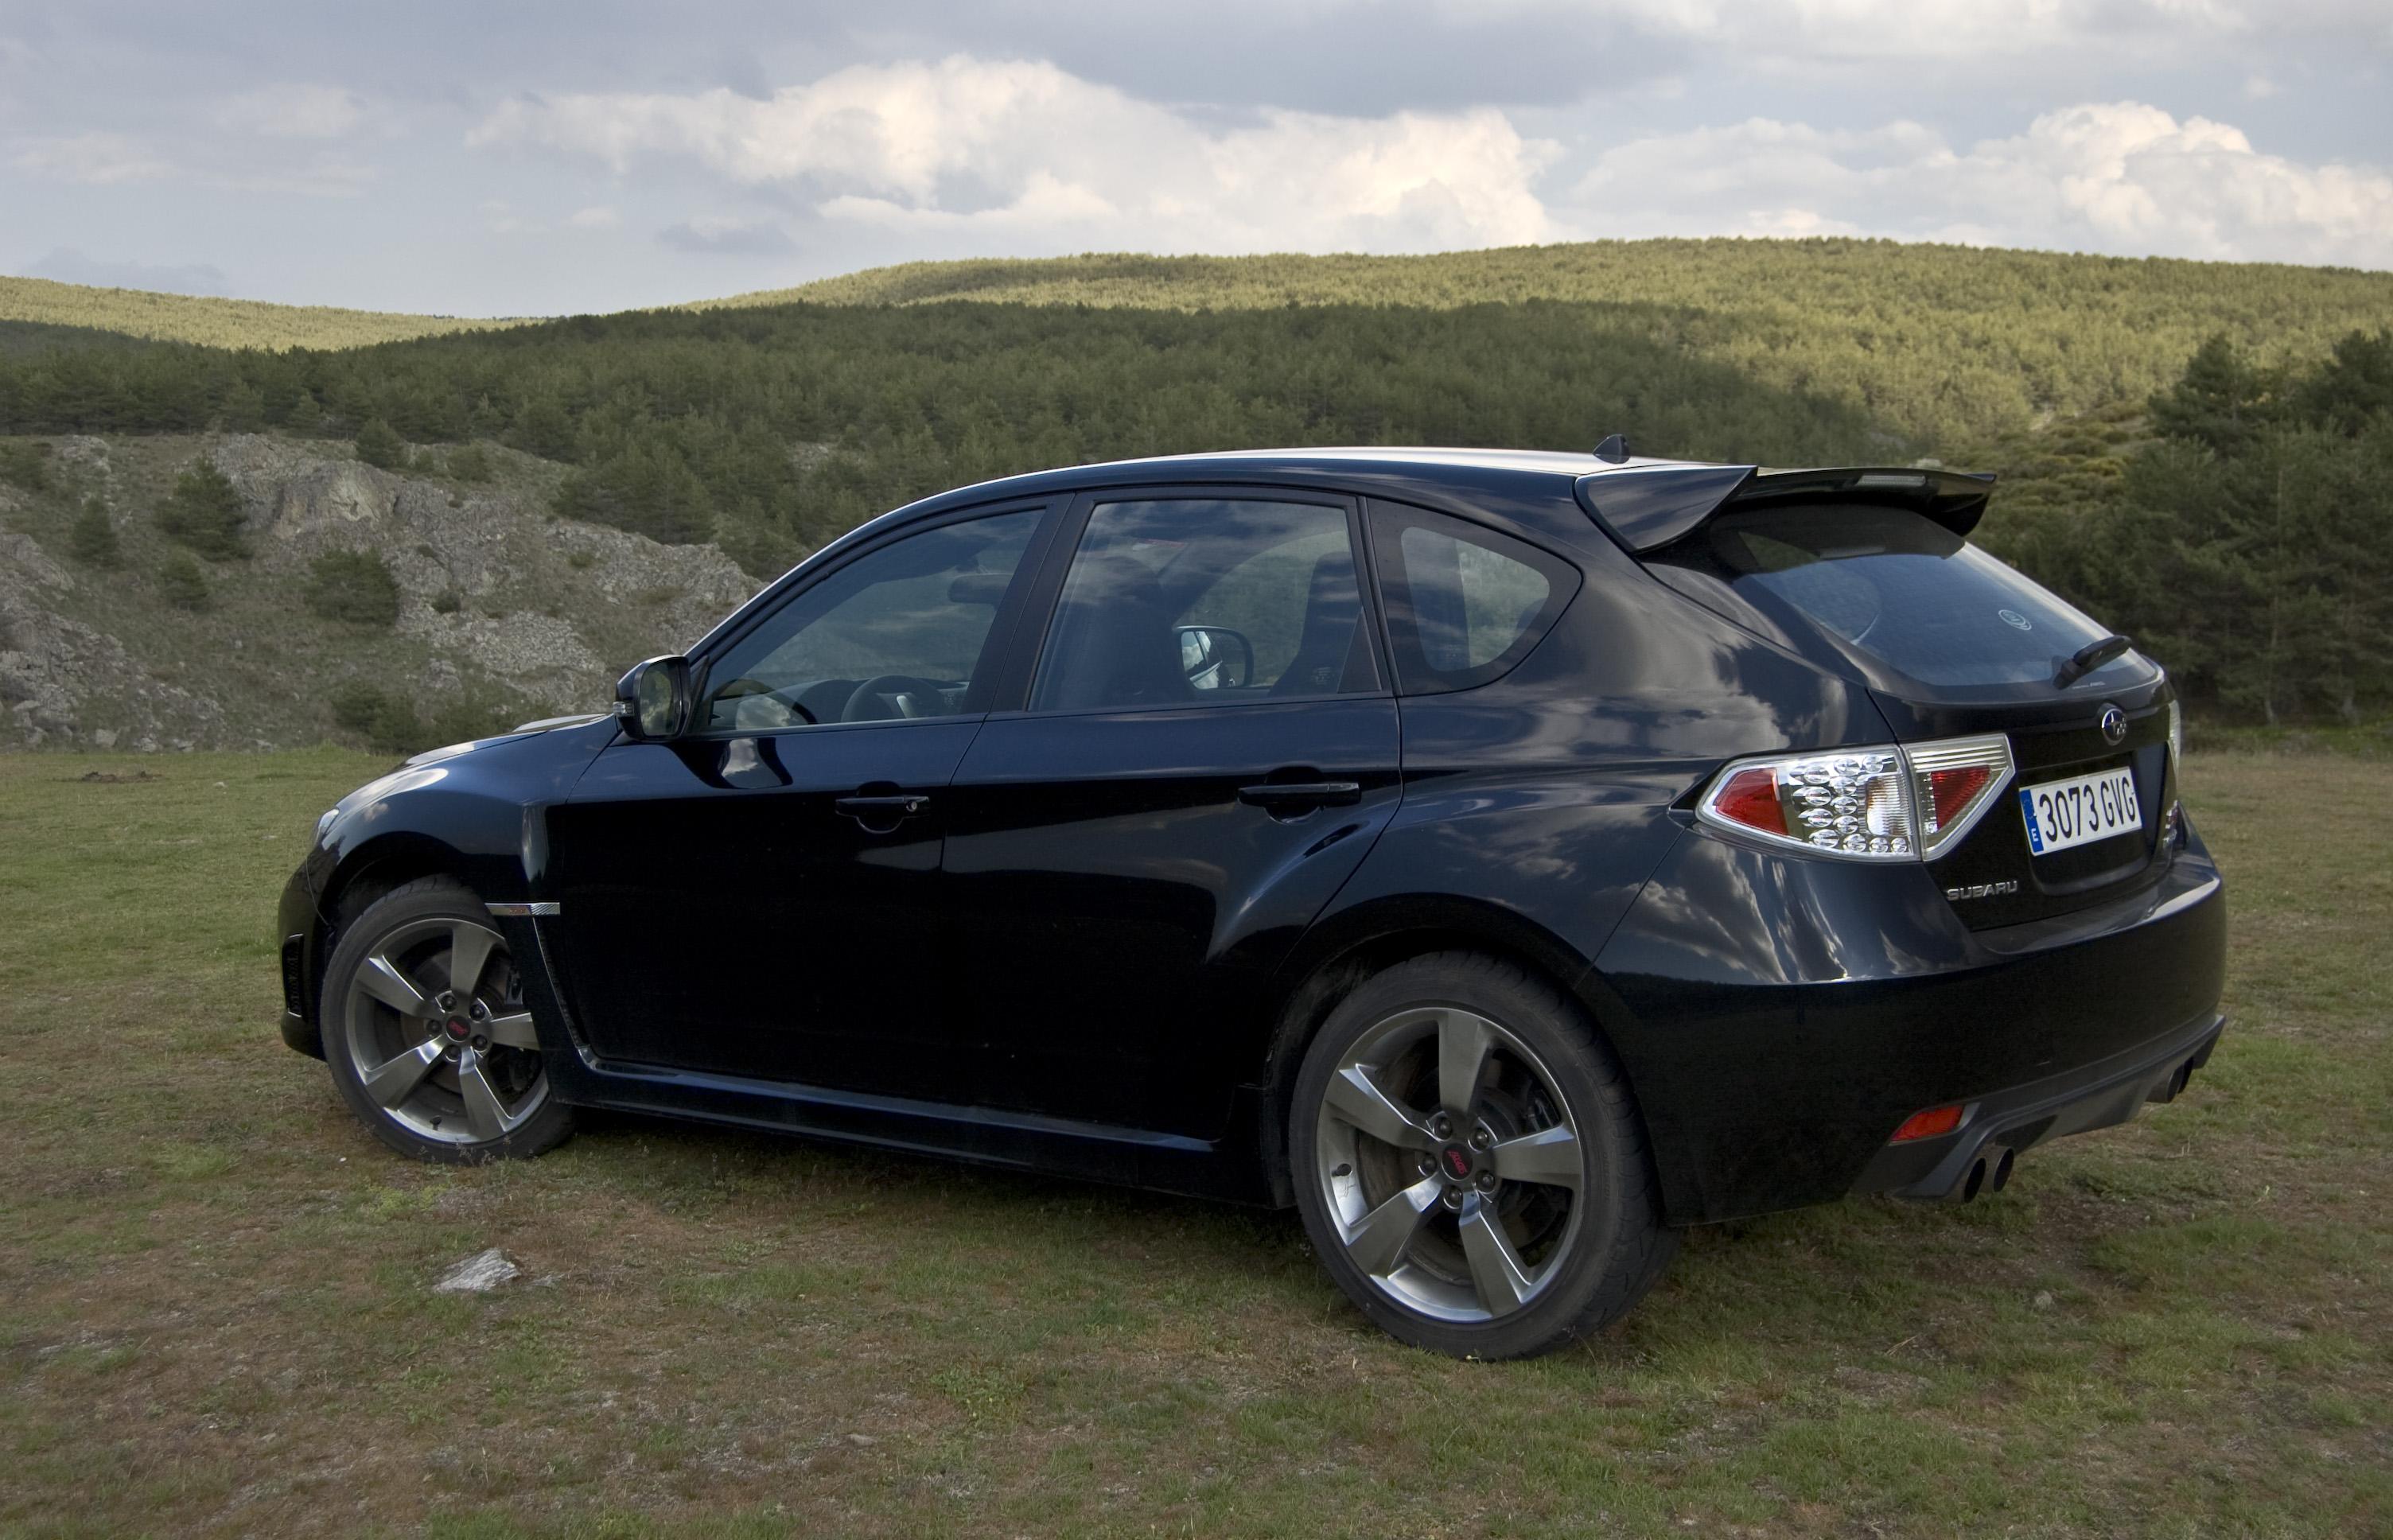 Subaru_Impreza_STI_-_Flickr_-_David_Villarreal_Fern%C3%A1ndez_%2819%29.jpg